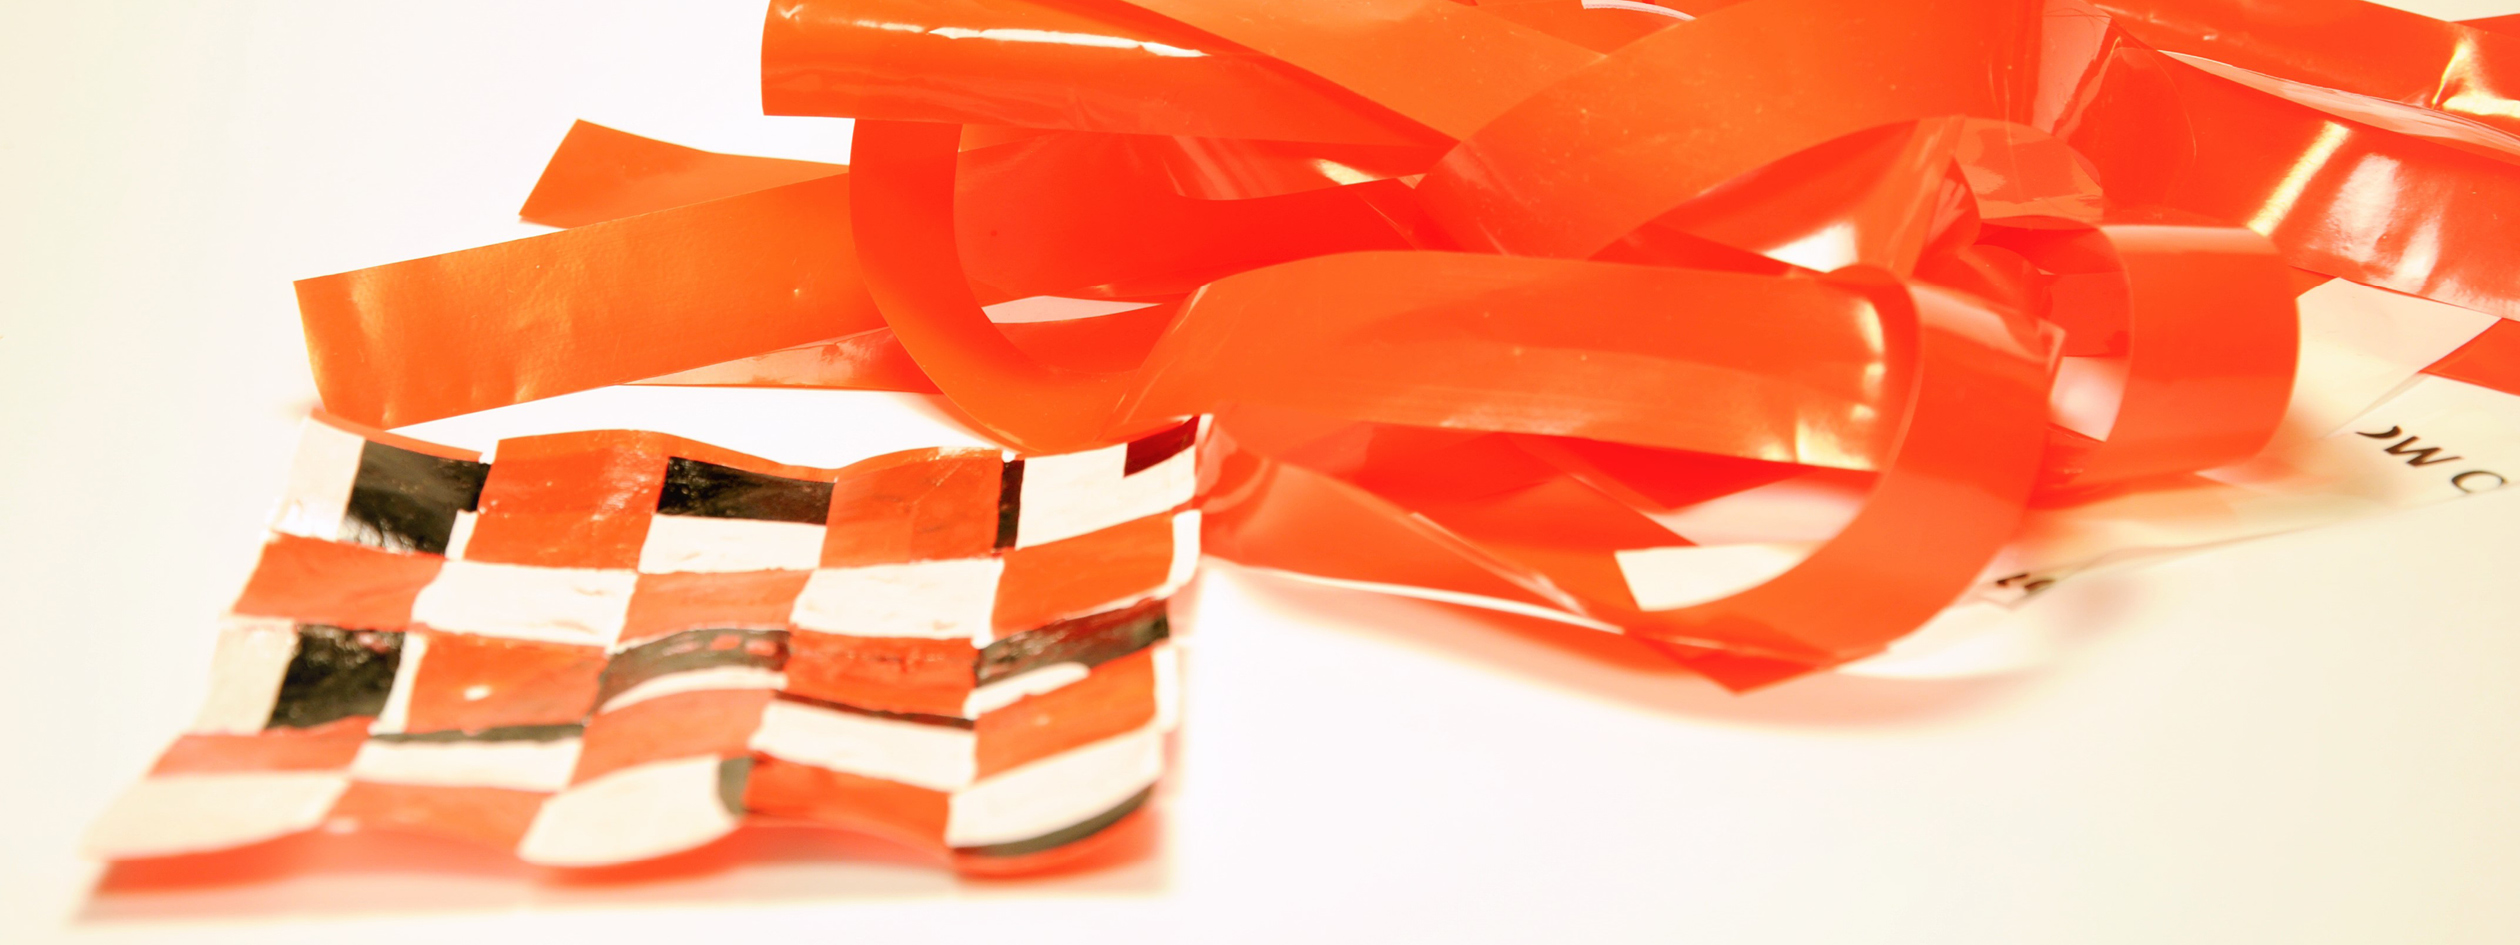 Masterstudio produktdesign upcycling designwerkstatt for Produktdesign bremen